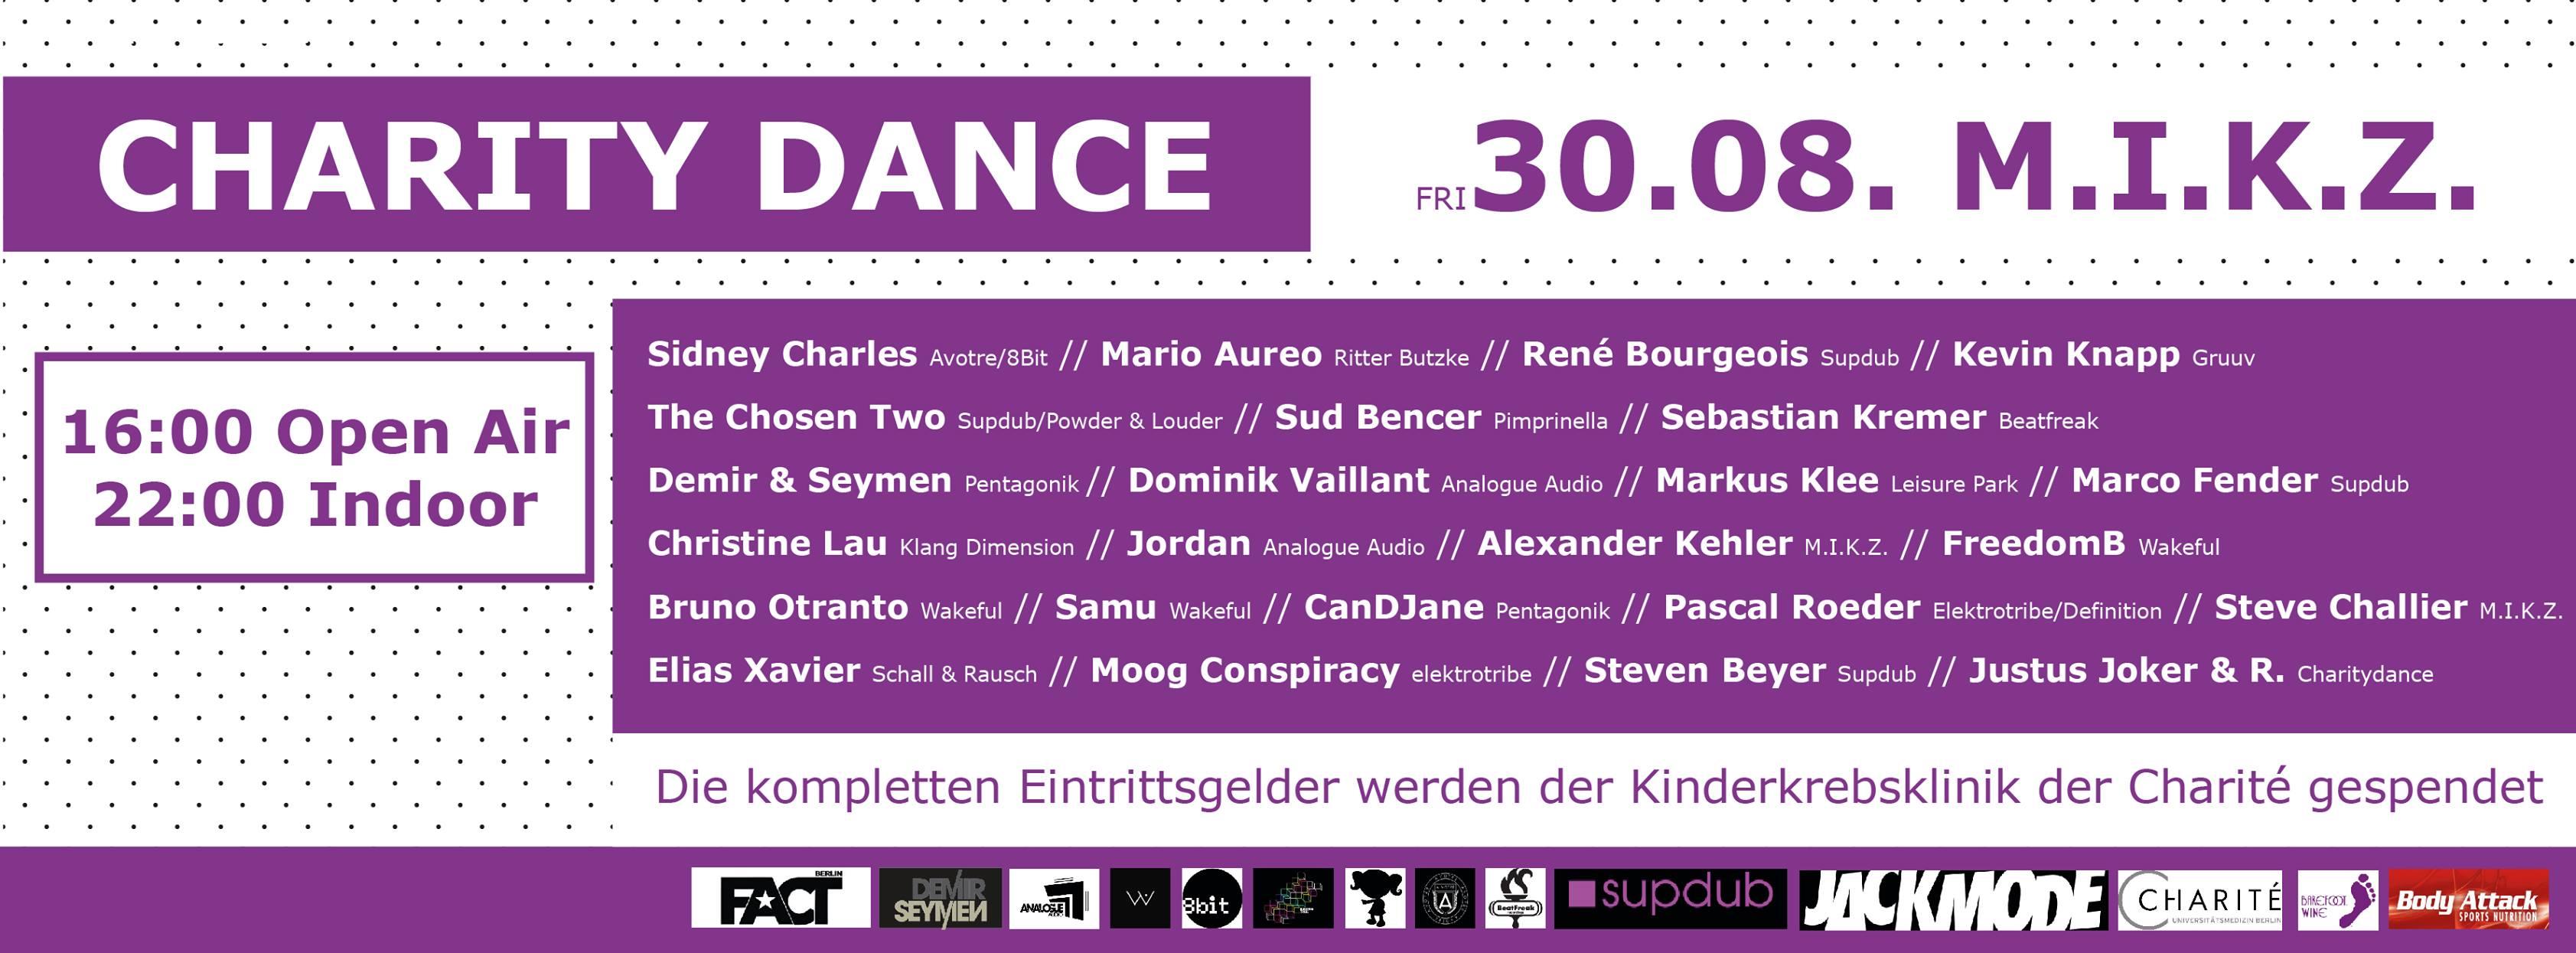 charity-dance-mikz